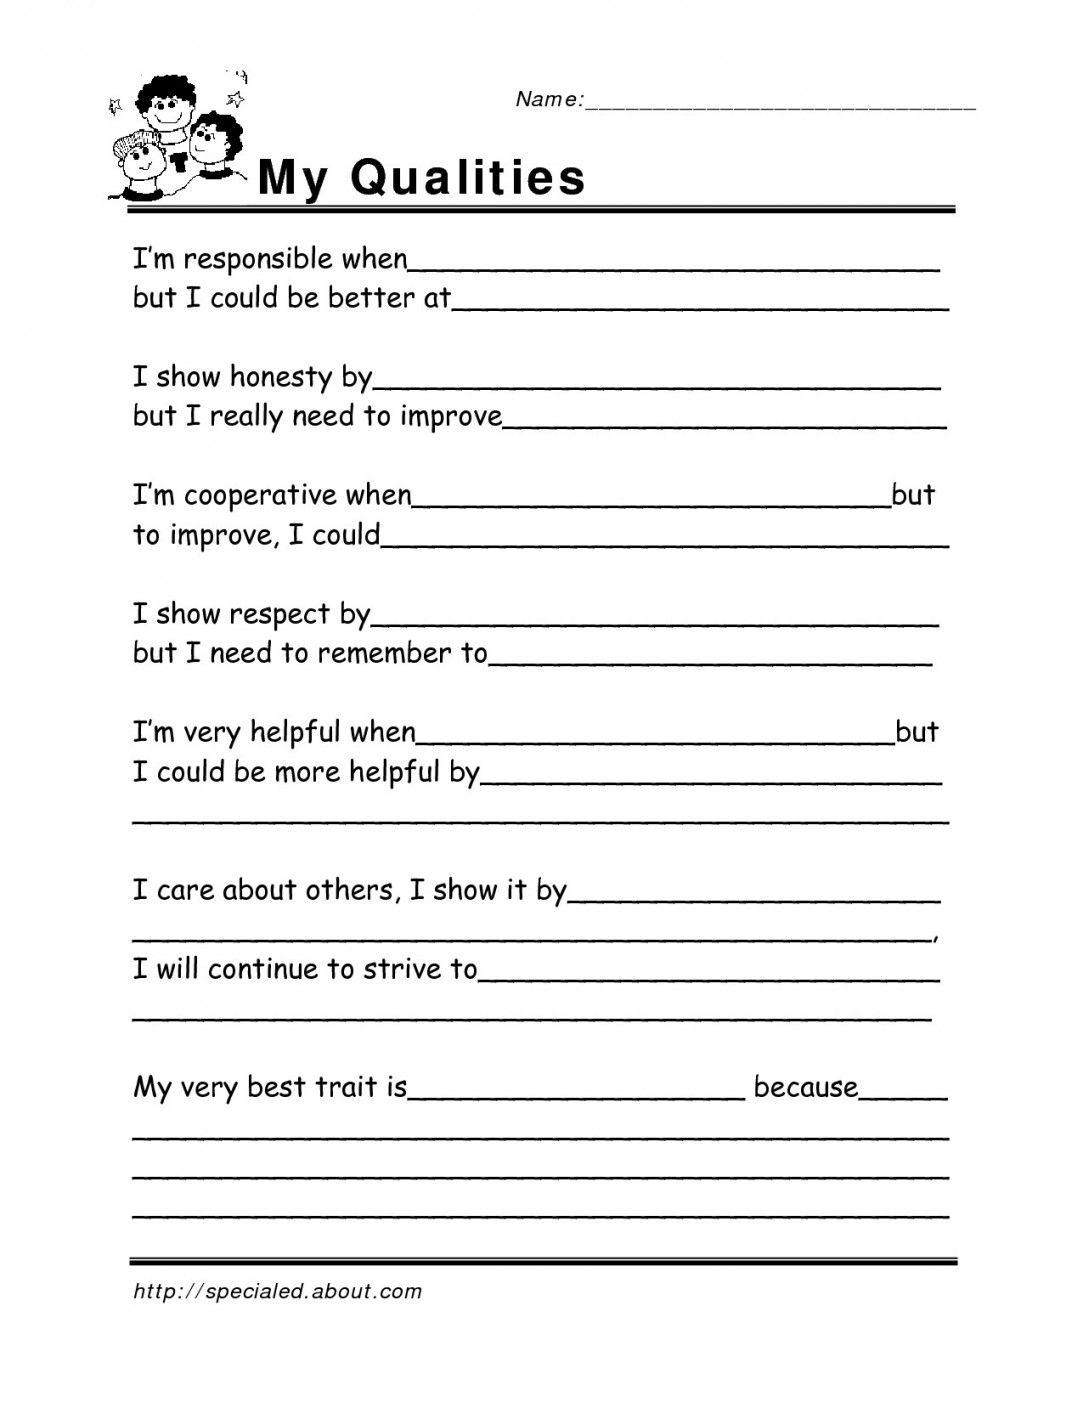 20 Printable Self Esteem Worksheets For Adults